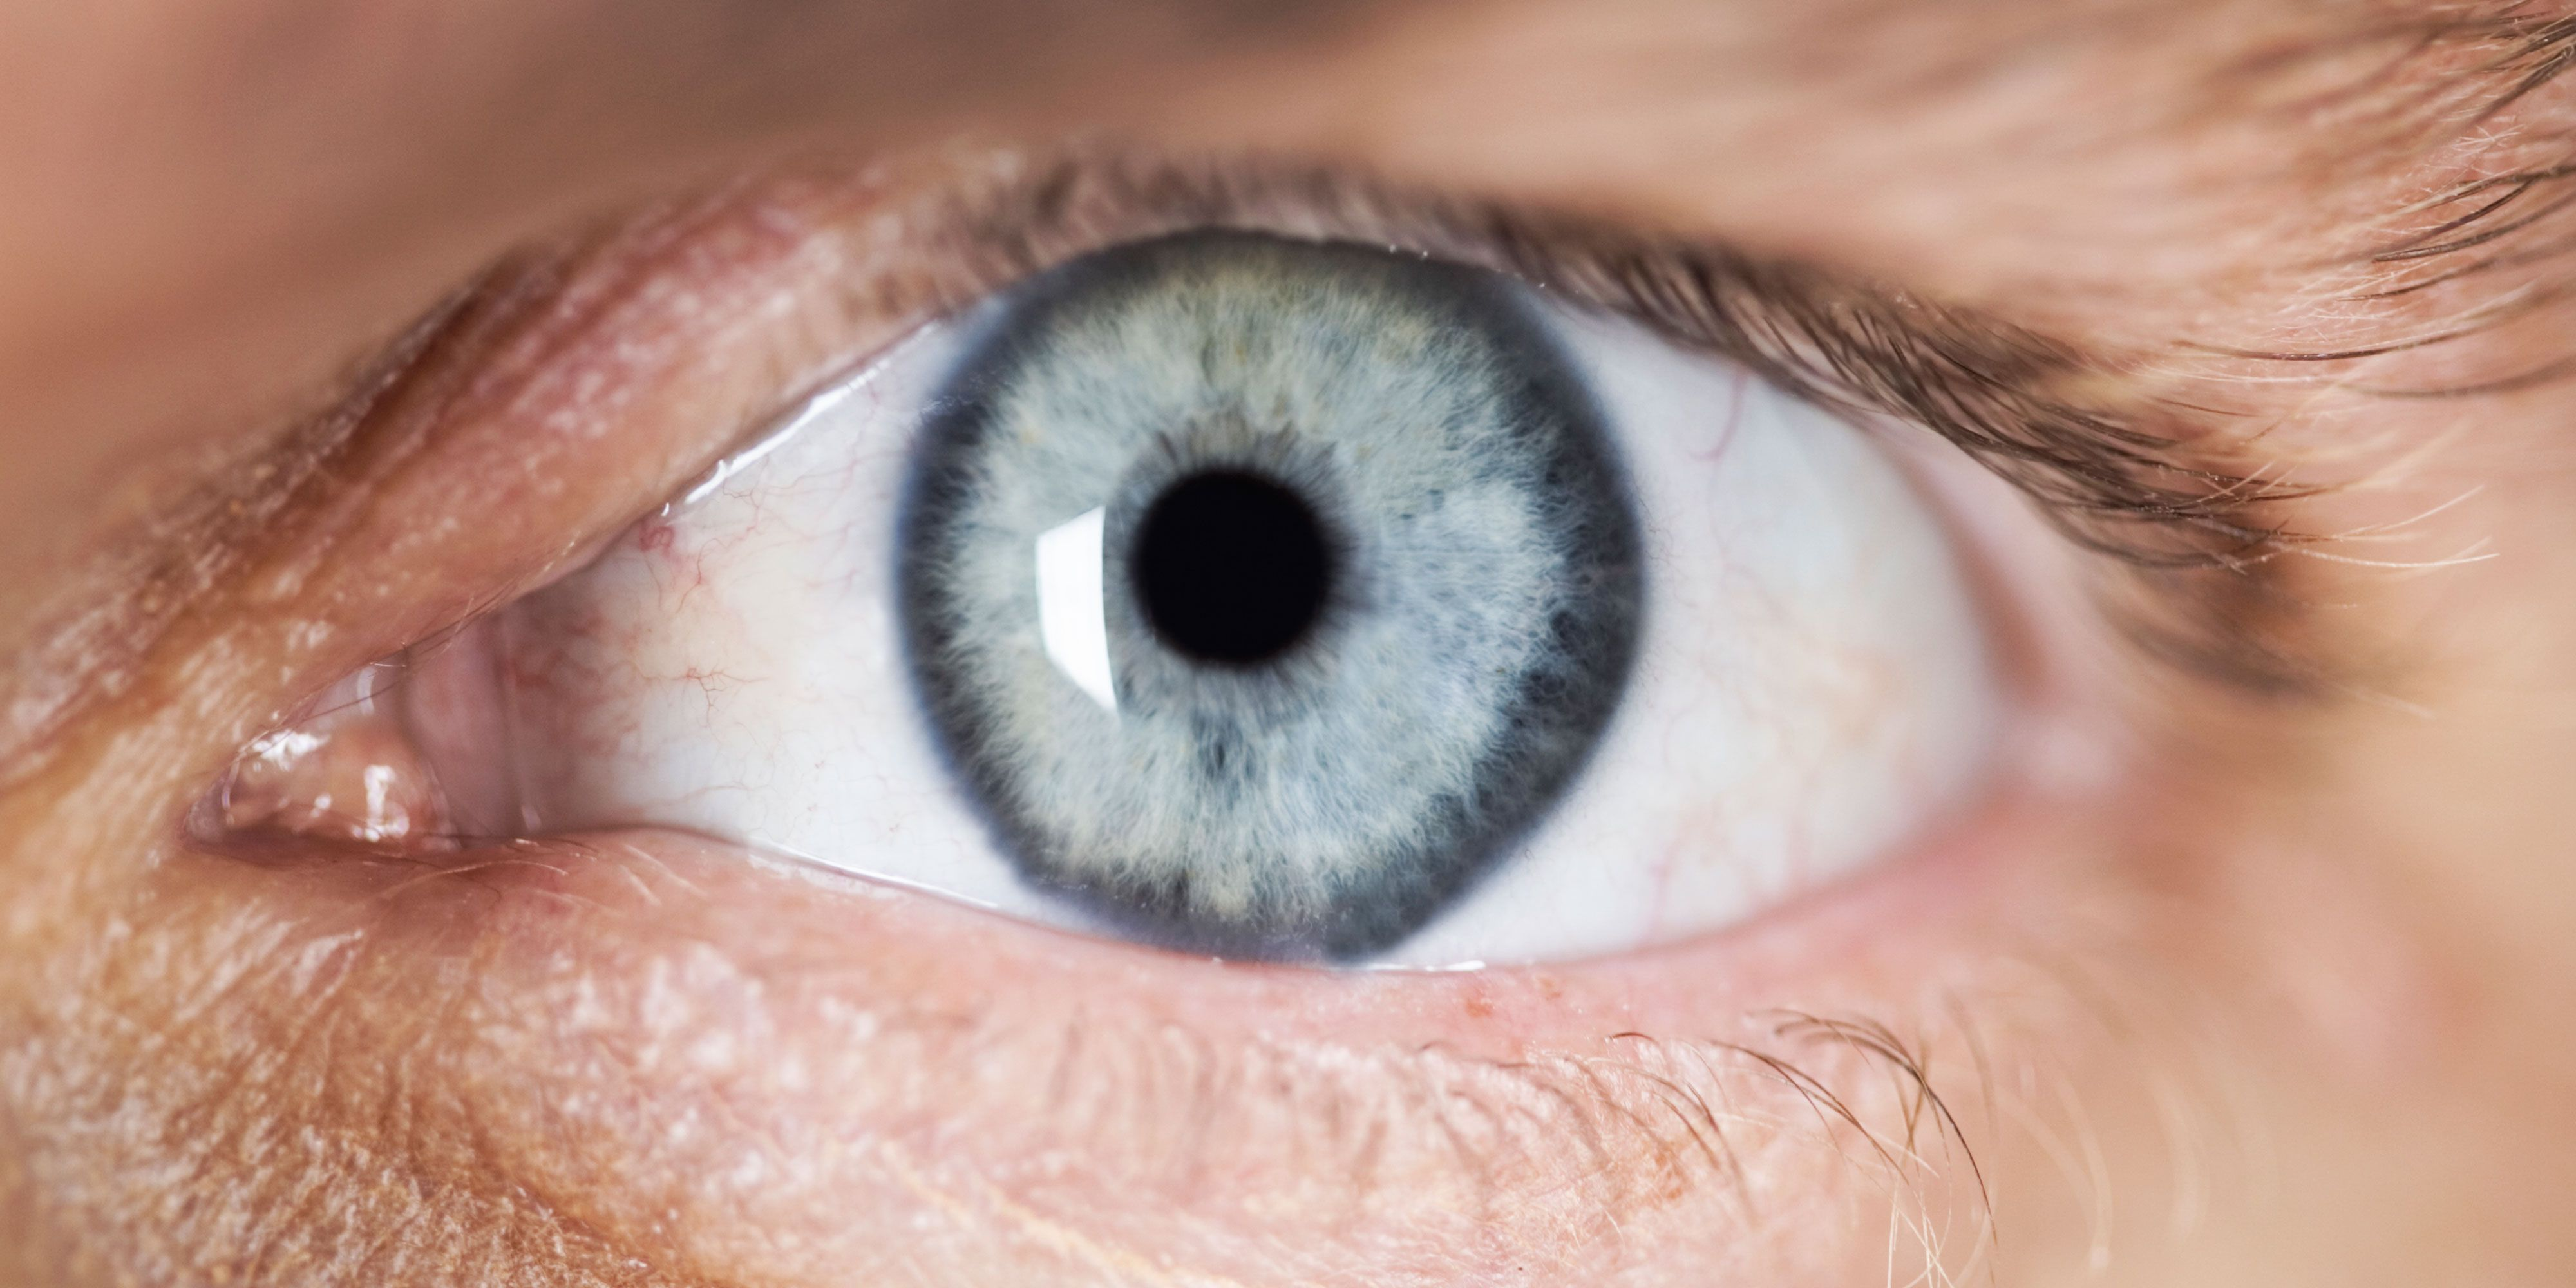 Ive Got A Black Spot In My Eye